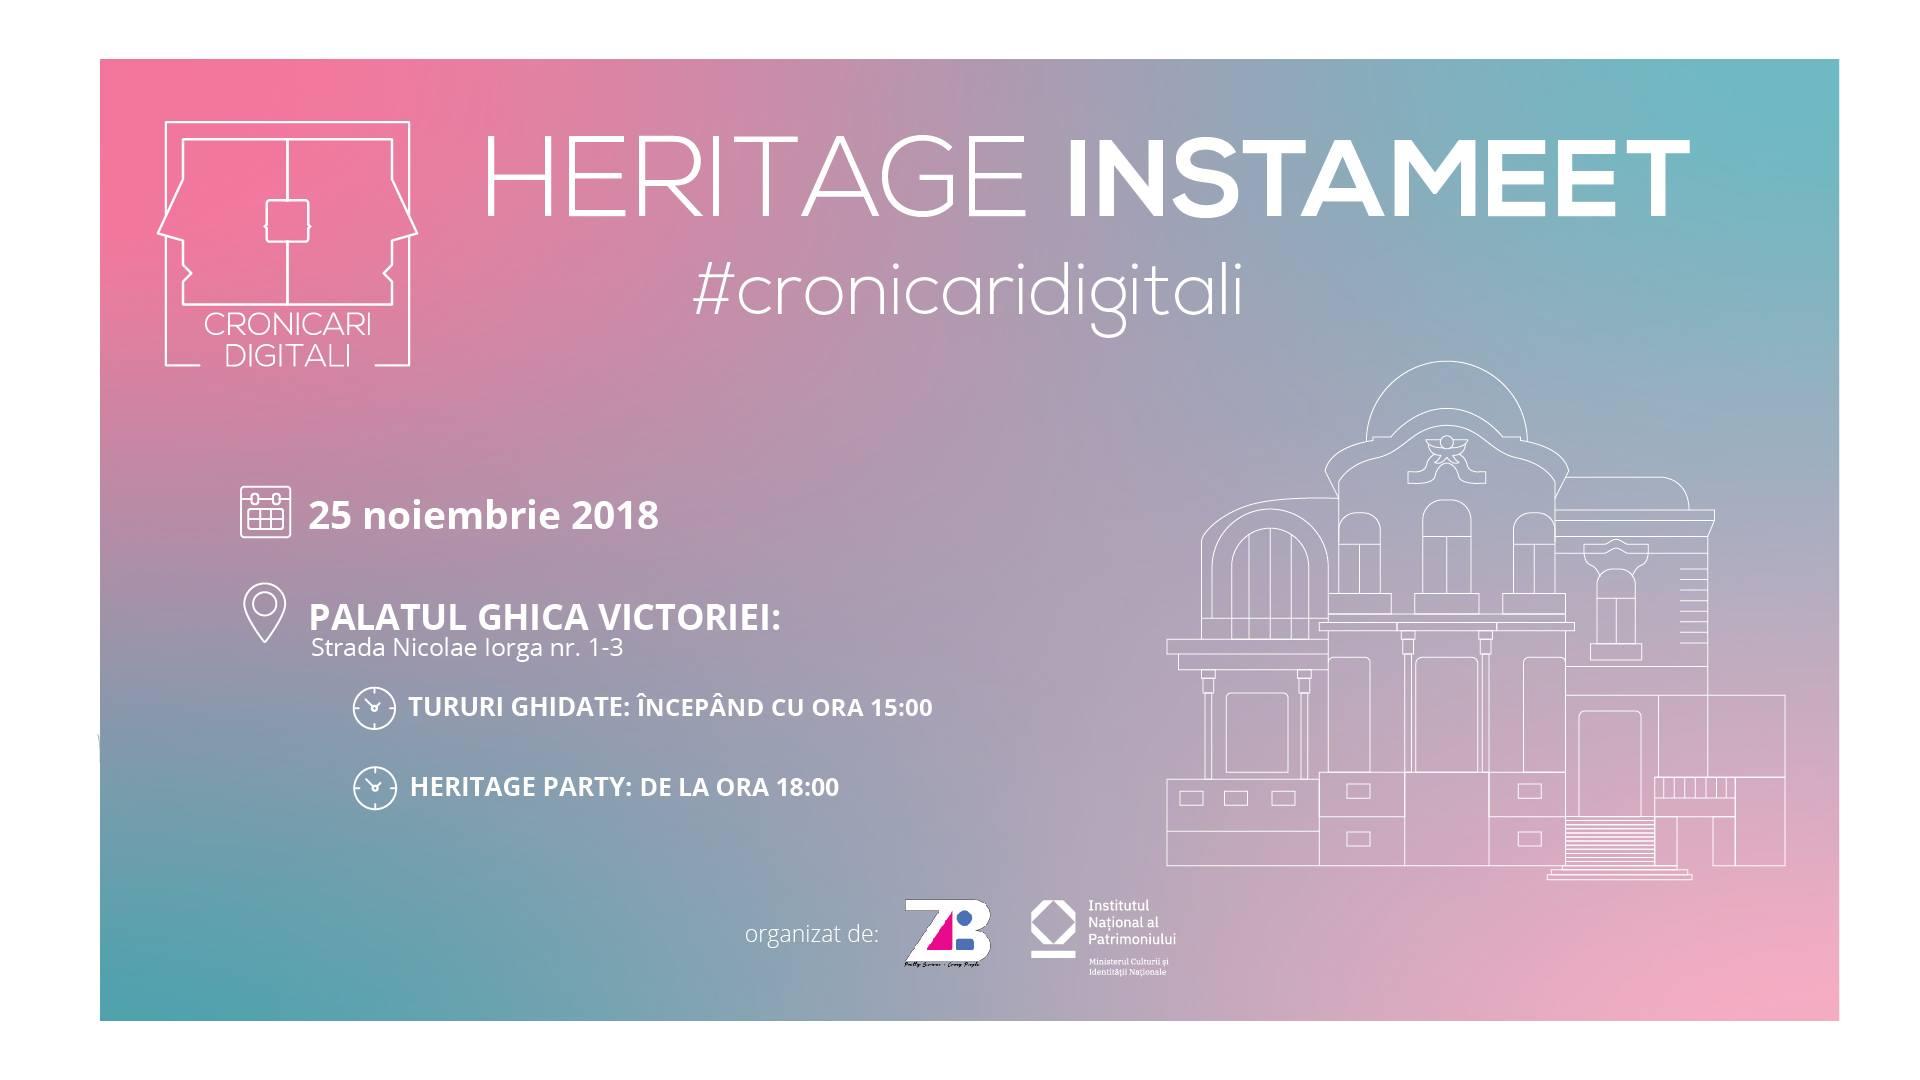 Cronicari digitali - Heritage Instameet